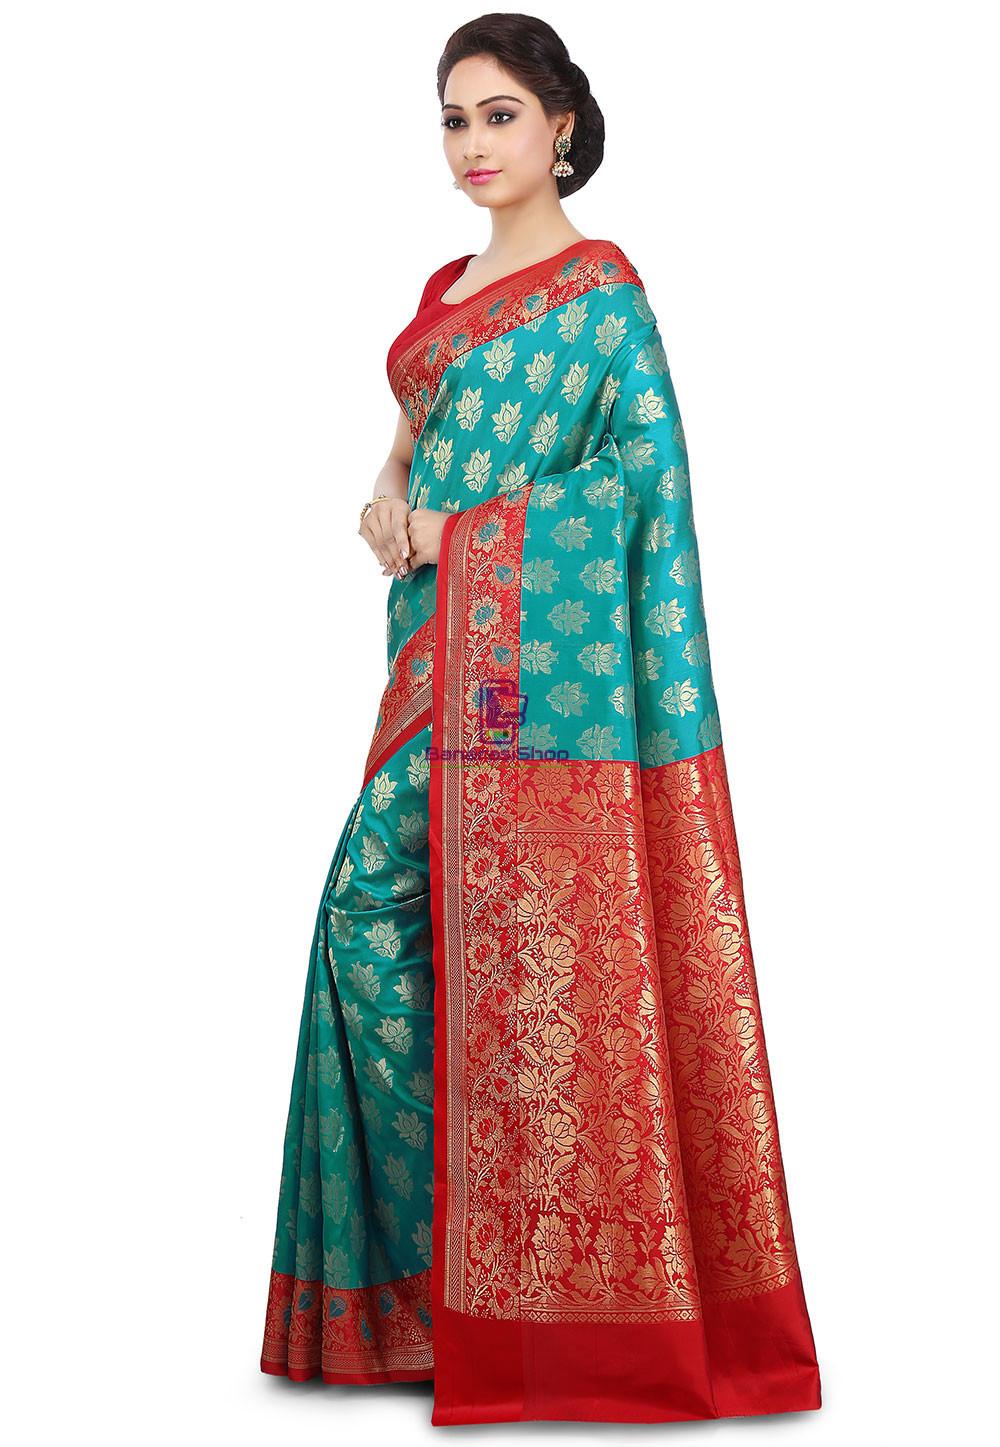 Woven Banarasi Art Silk Saree in Teal Green 5